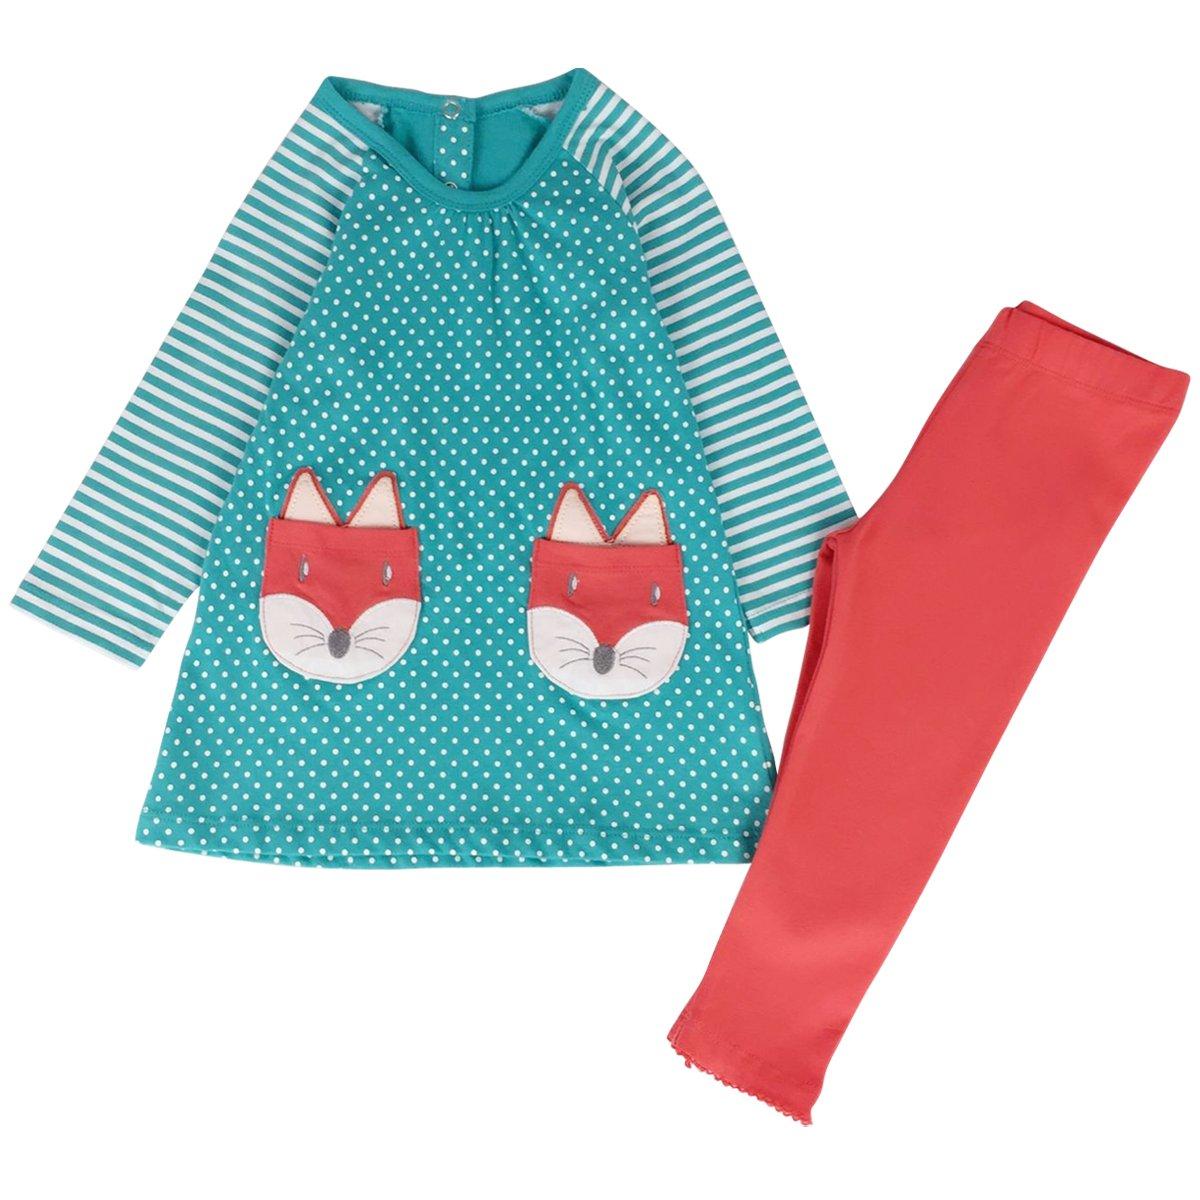 Jastore Kids Girl Cute 2PCS Striped Clothing Set Long Sleeve Top +Leggings Outfits (7T, Blue)